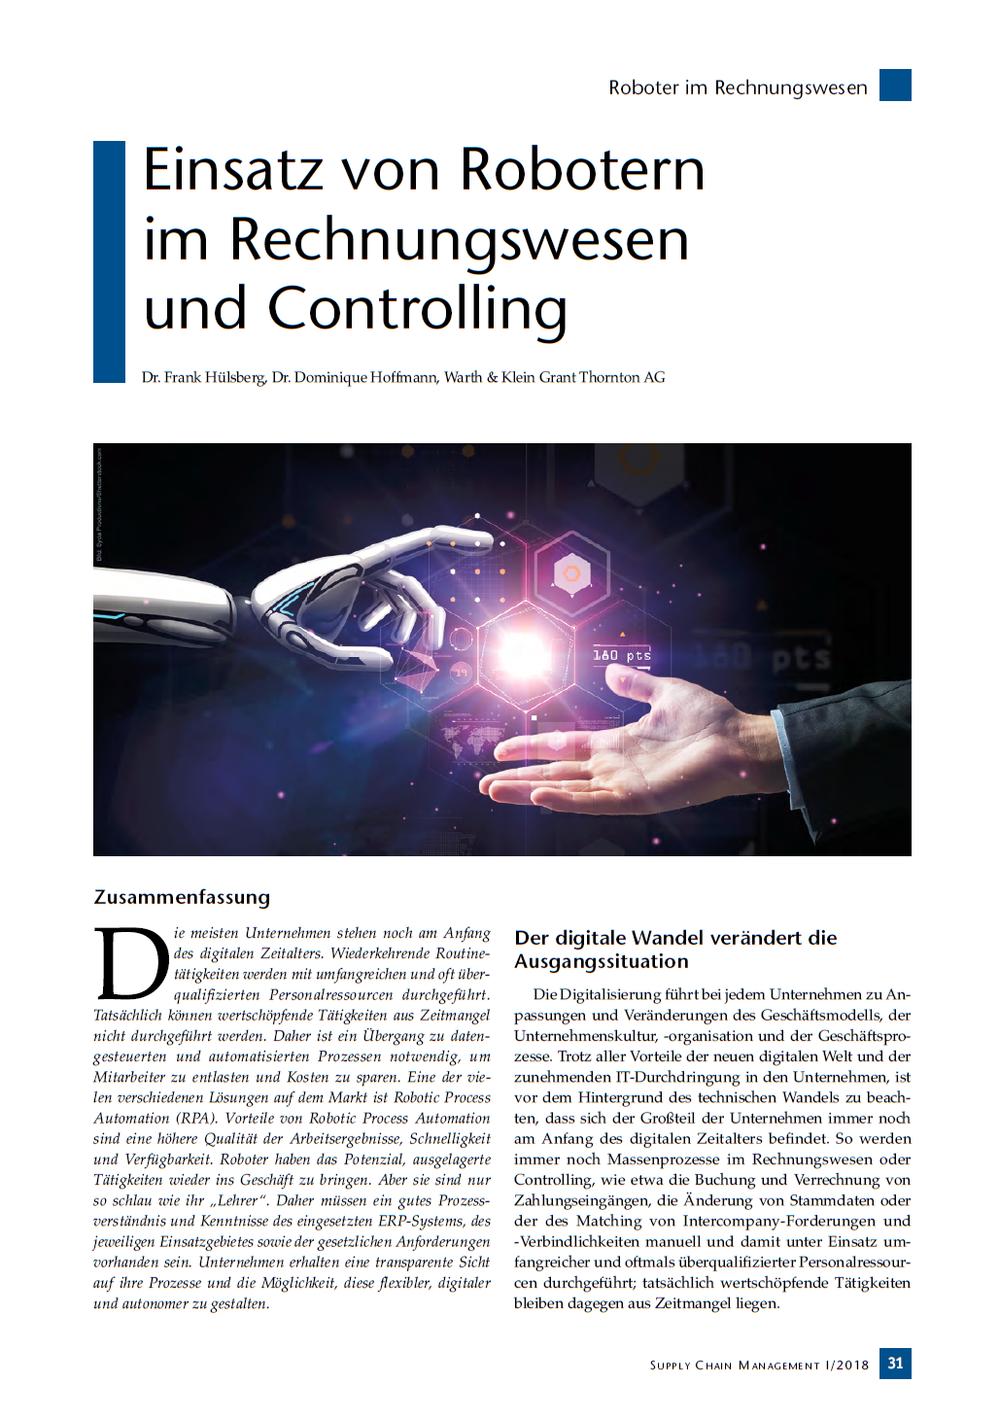 SCM 2018_I FDM Artikel 5 Roboter im Rechnungswesen Cover.png